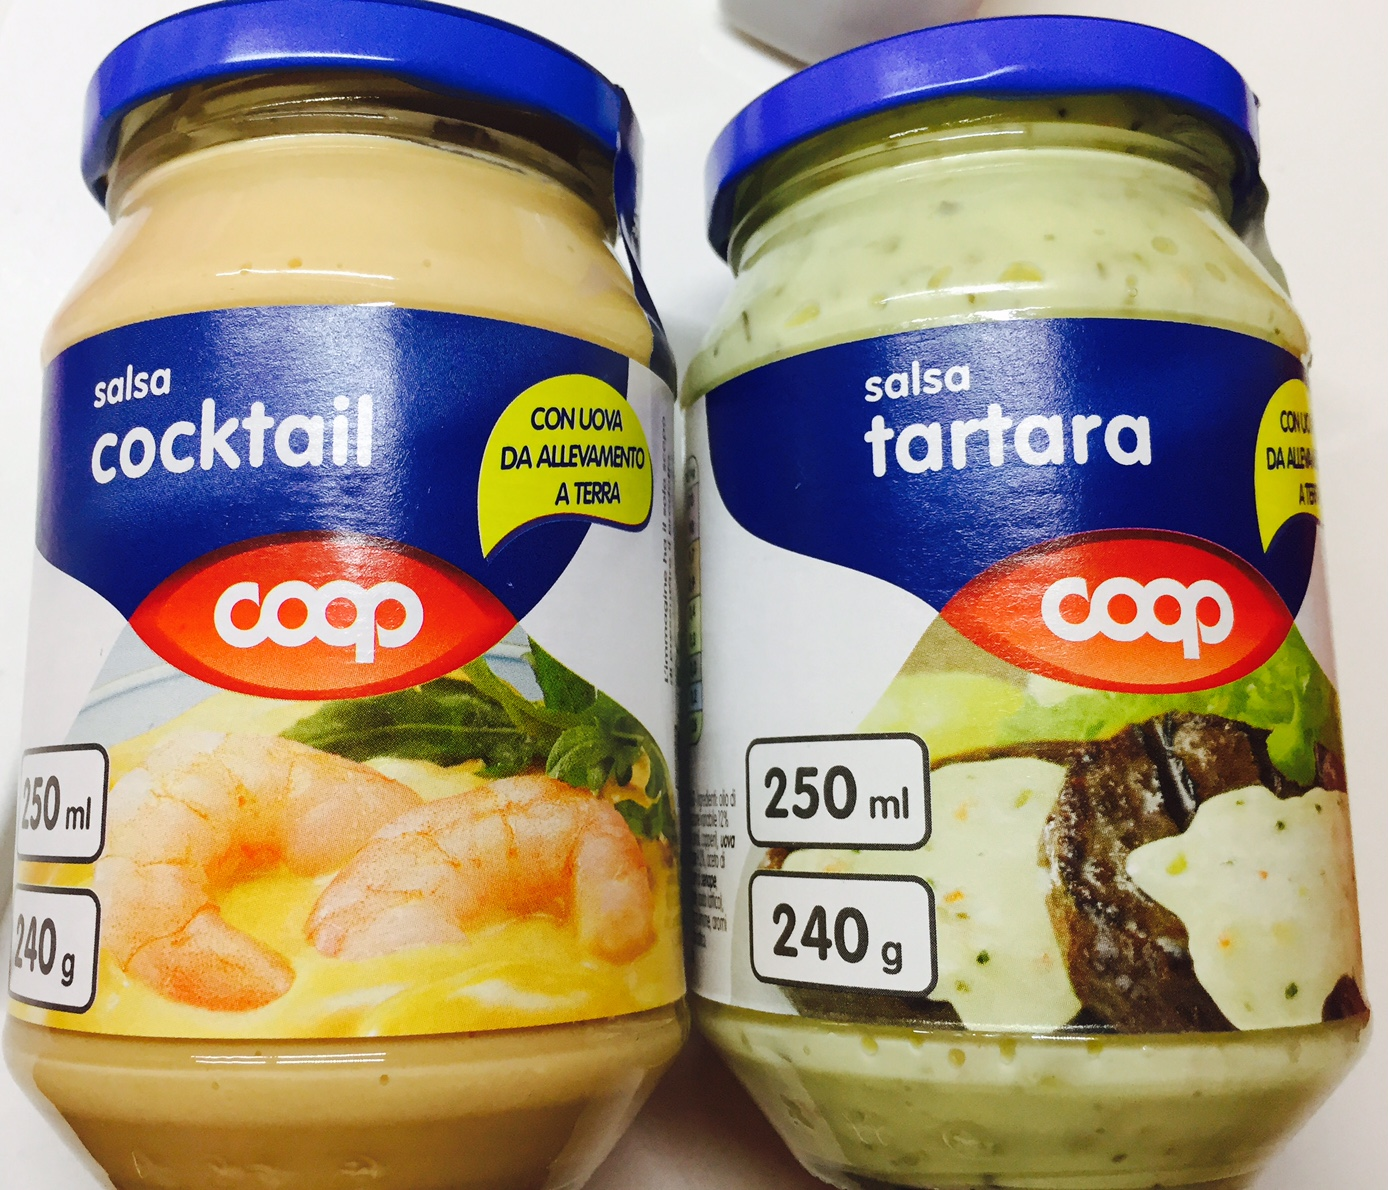 Salsa tartara e salsa cocktail Coop - lattosio 0% Image